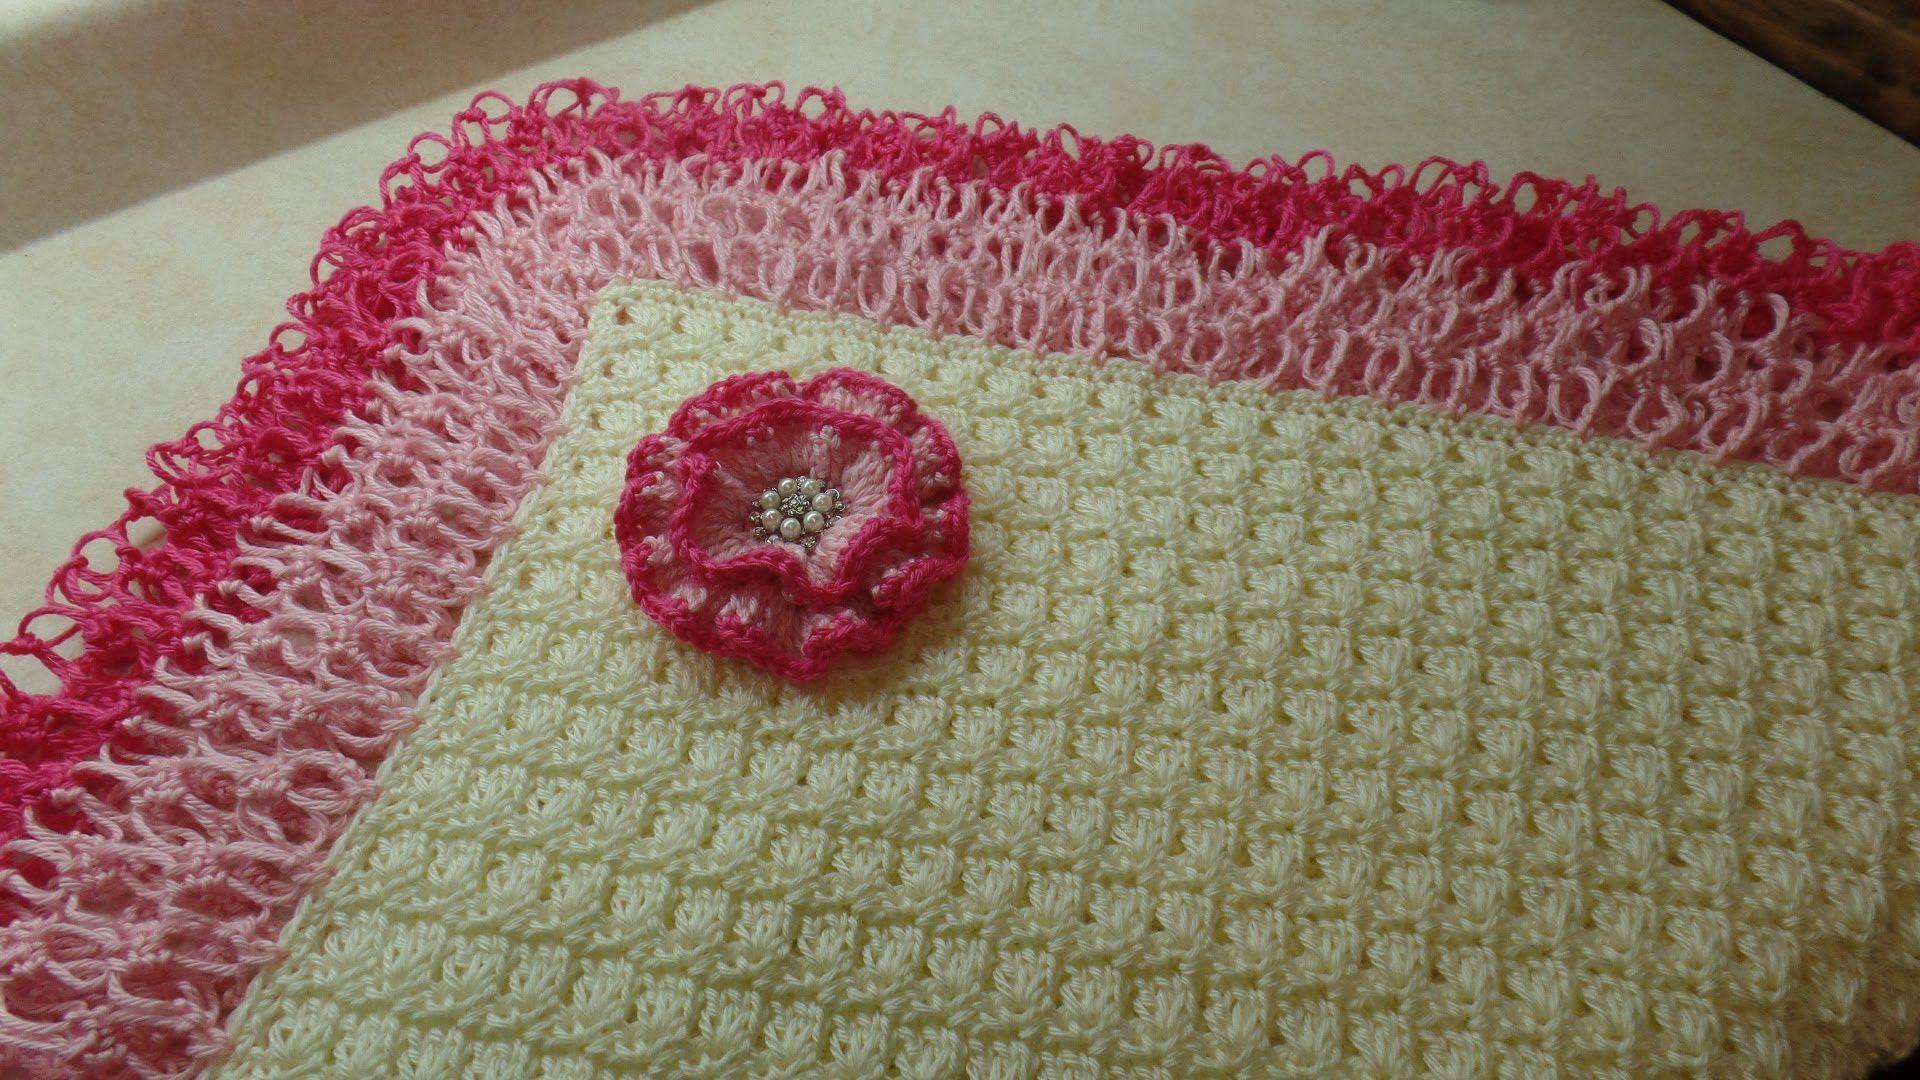 Crochet how to crochet beautiful lacy baby blanket tutorial 286 crochet how to crochet beautiful lacy baby blanket tutorial 286 baditri Image collections